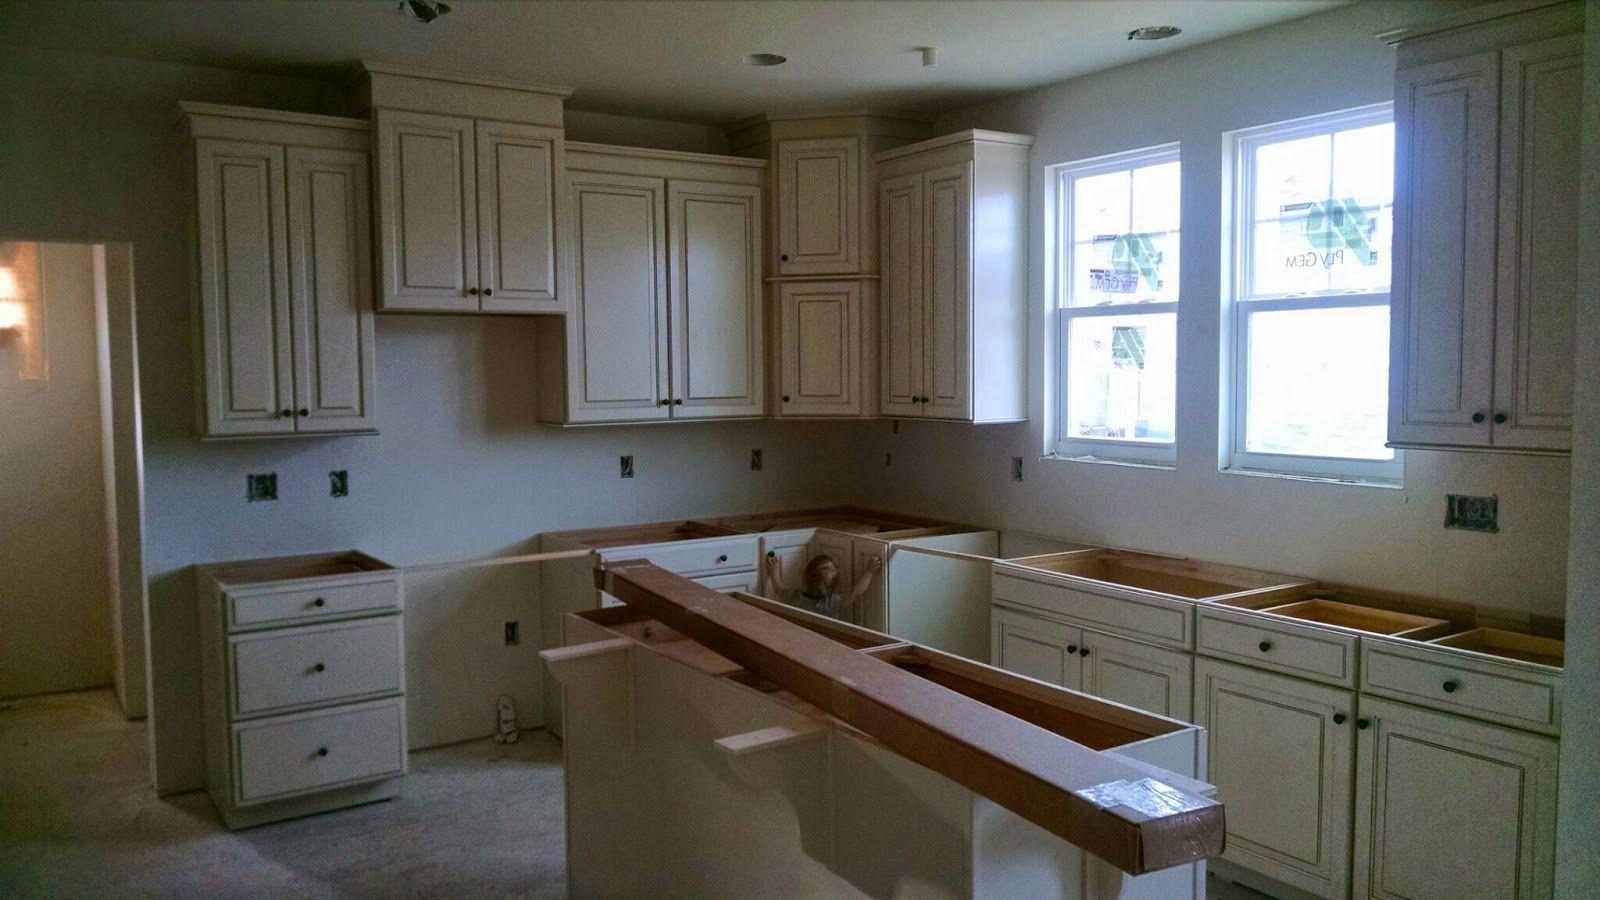 Rushmore's Hazelnut glaze cabinets   Home projects ...